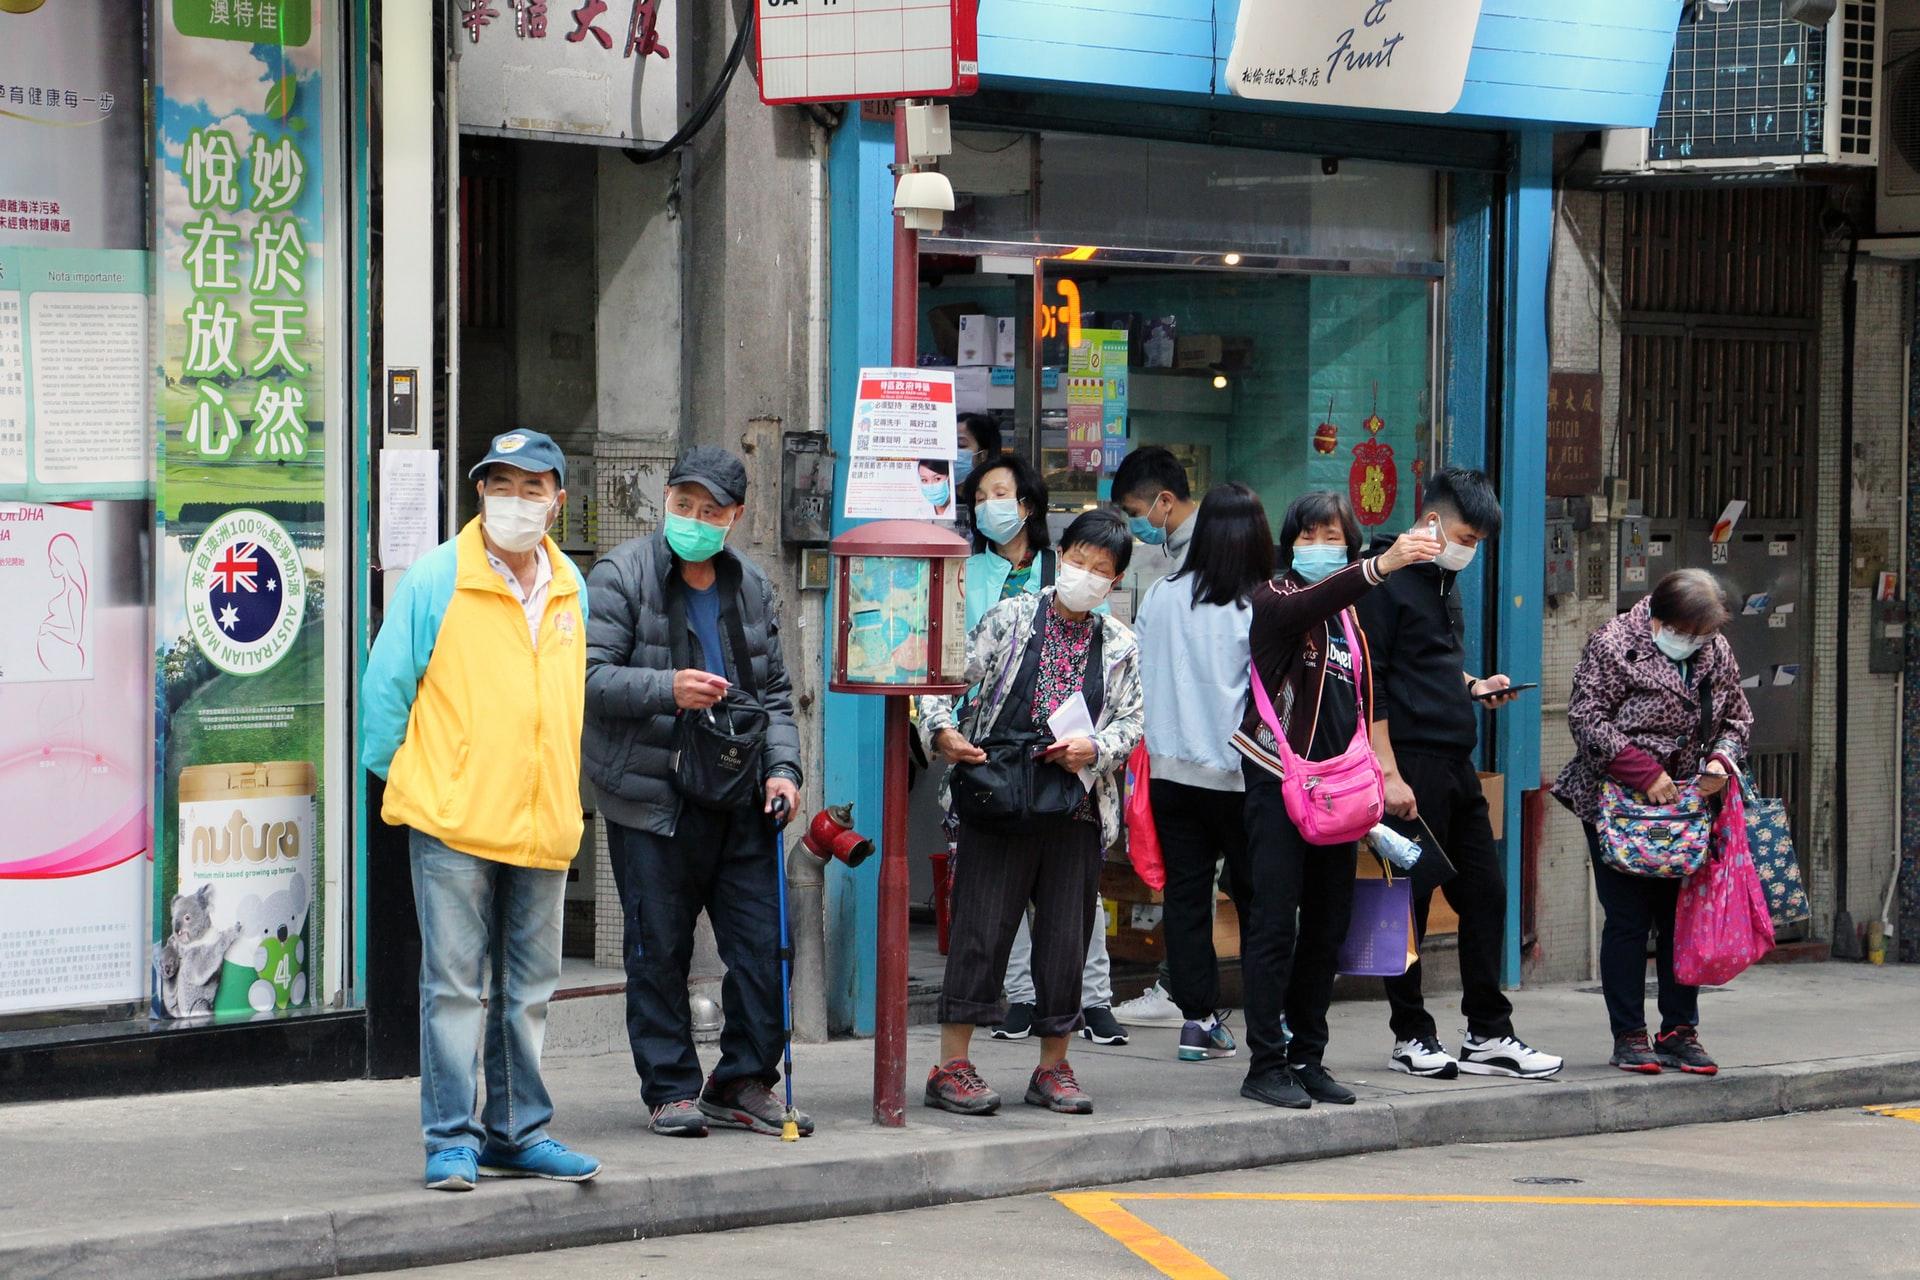 Macau Wealth Partaking casino tax revenue